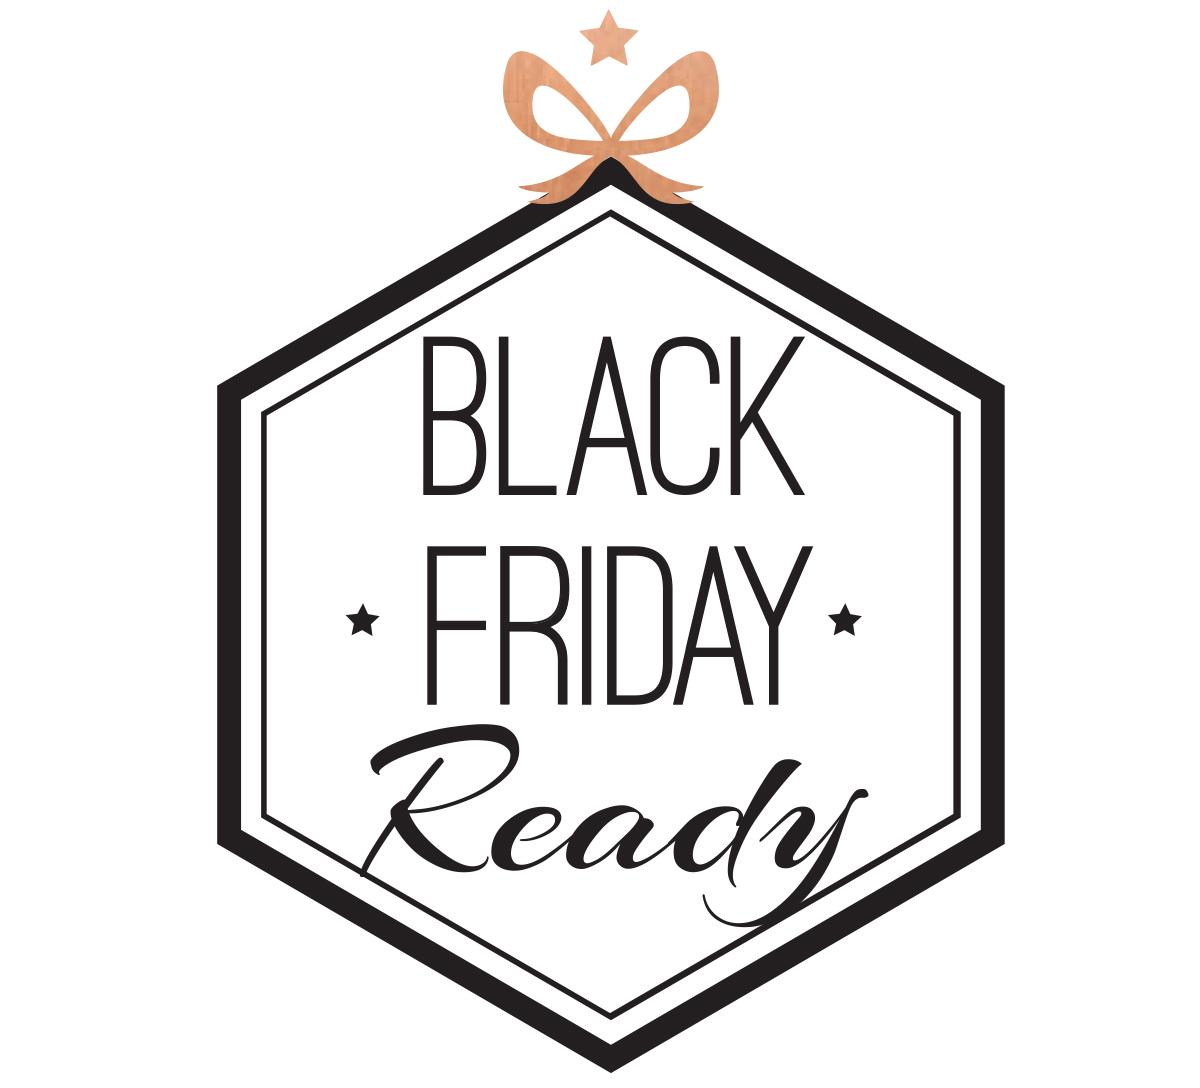 MHB-black-friday-ready-logo.jpg